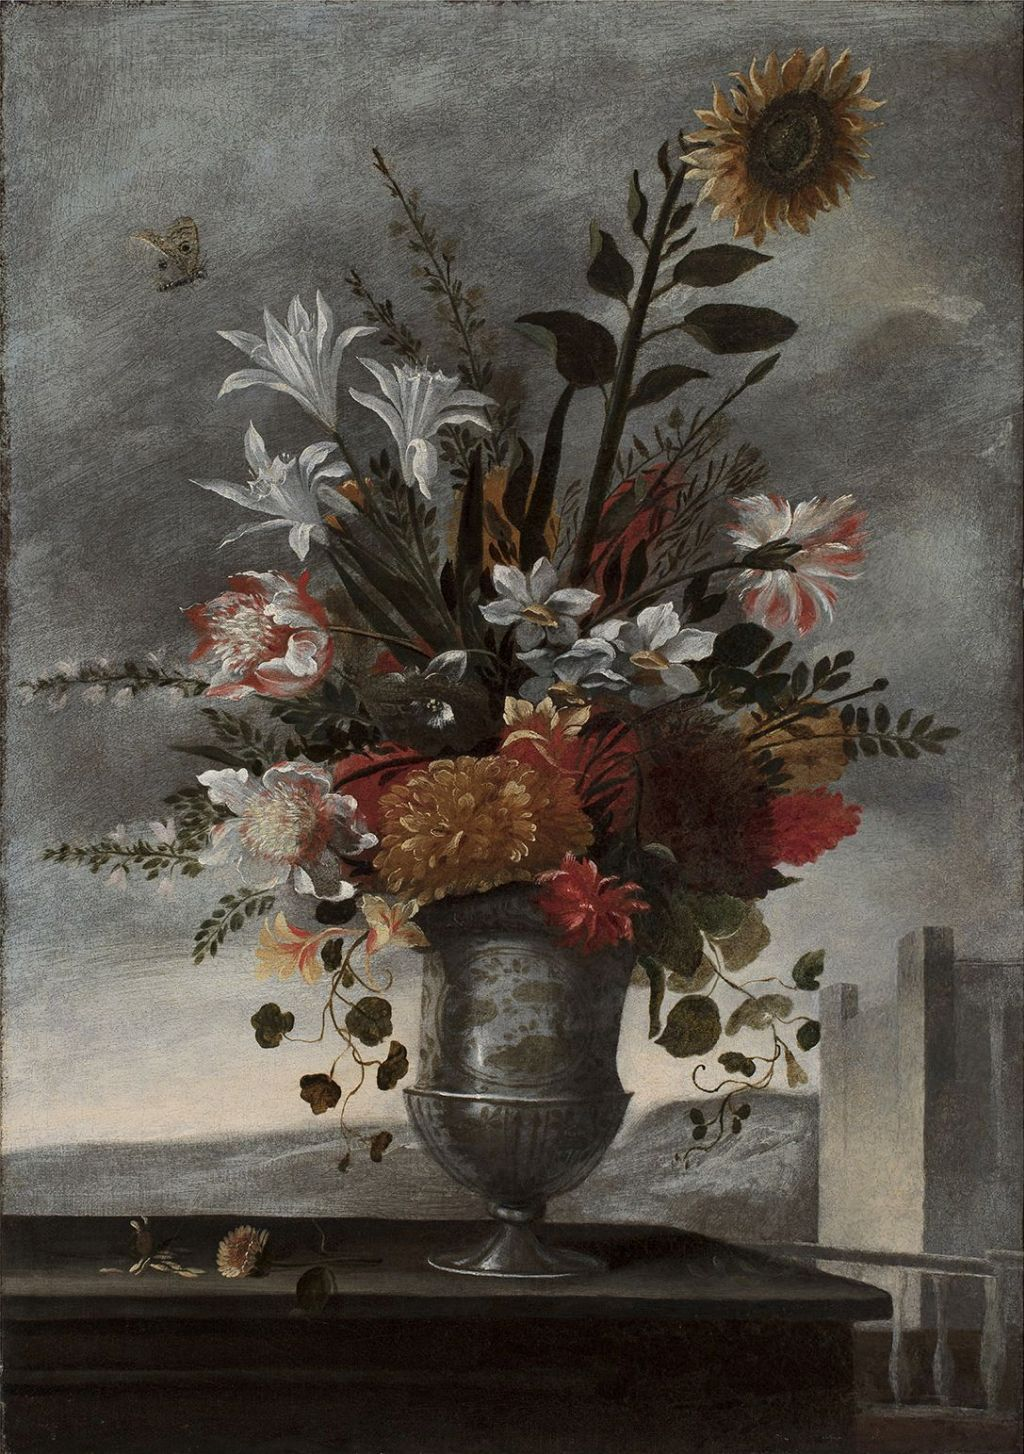 Parella de florers, Pedro de Camprobín